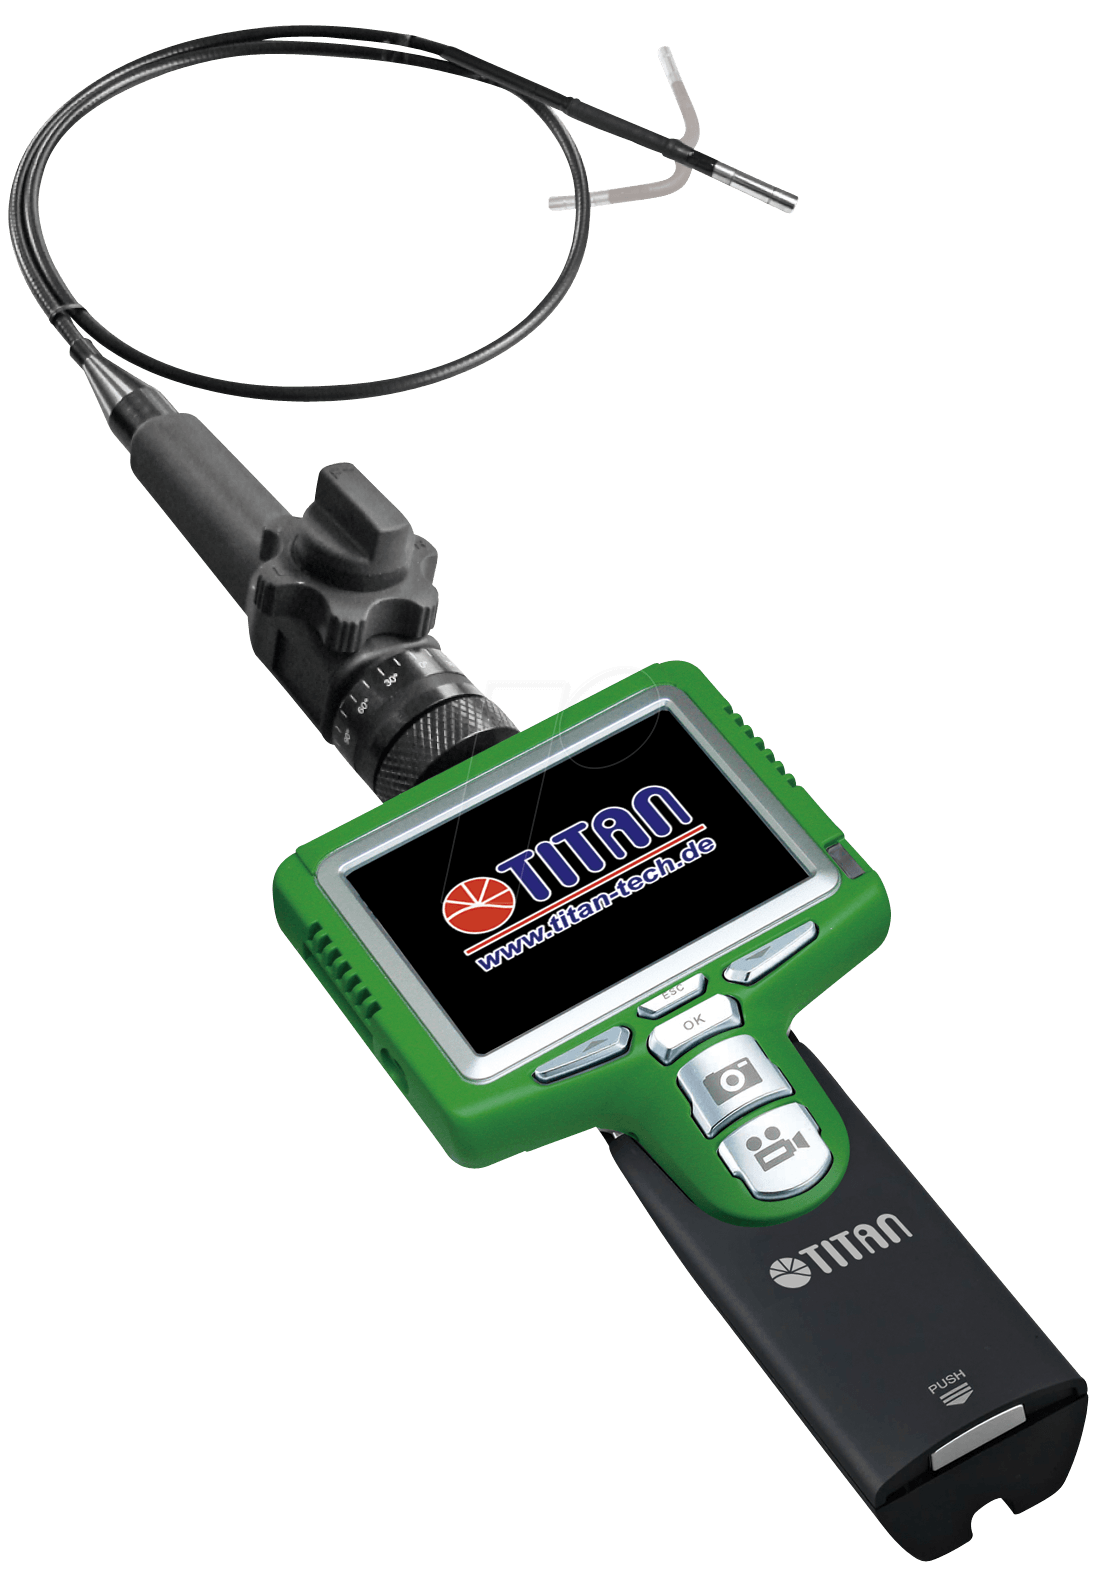 TITAN ENDO S06-5.8 270 - Digital Endoskop, schwenkbarer Kamerakopf (TTS-S06-5.8 270°)